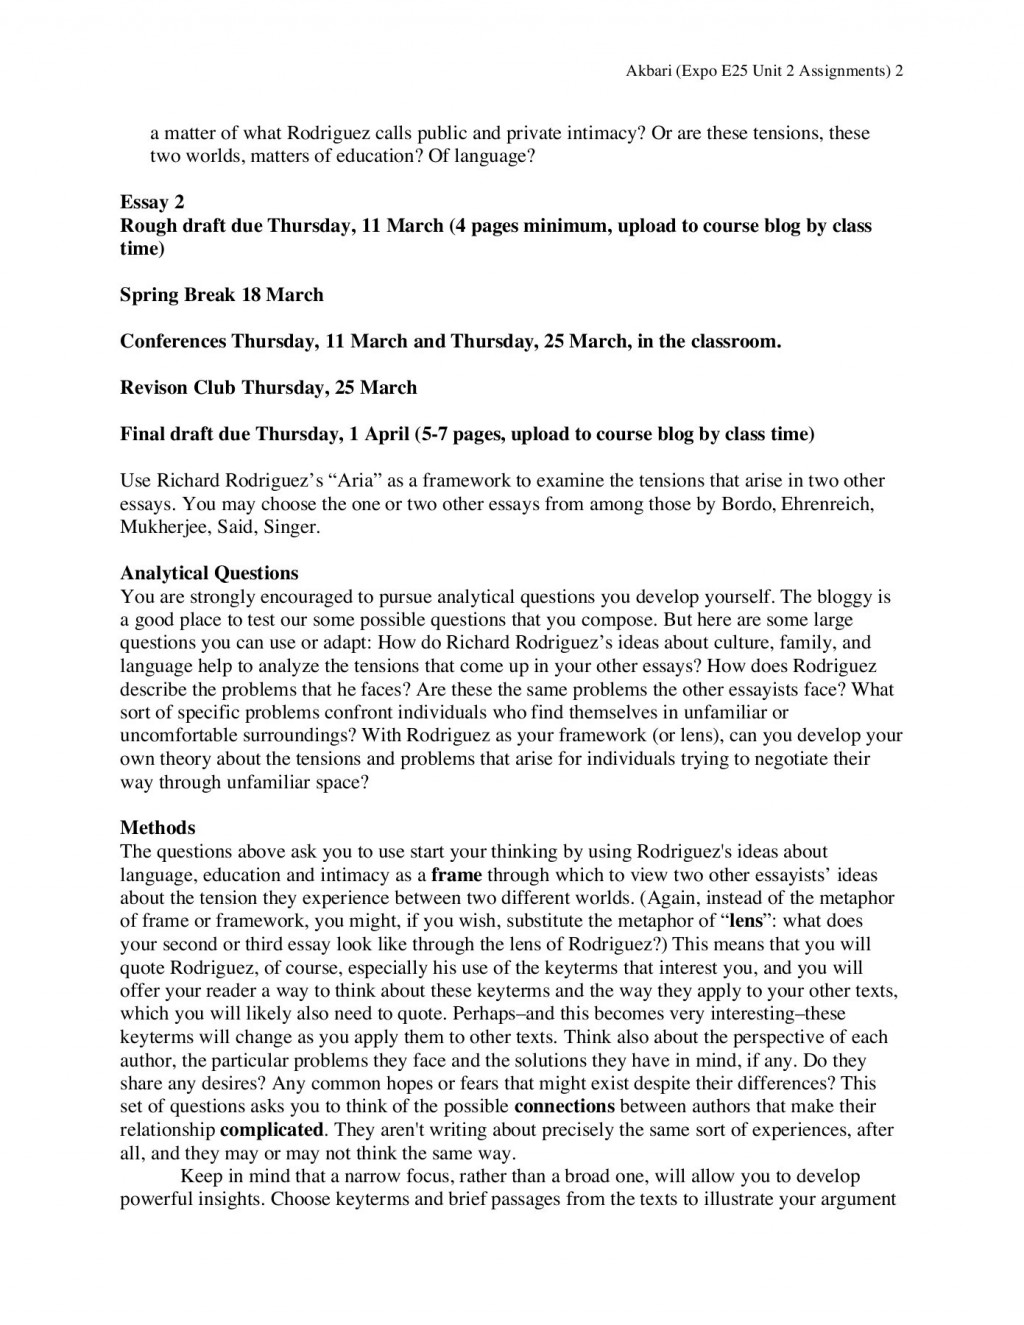 008 Essay Example Spring Stupendous Break Plans Alternative Outline Large